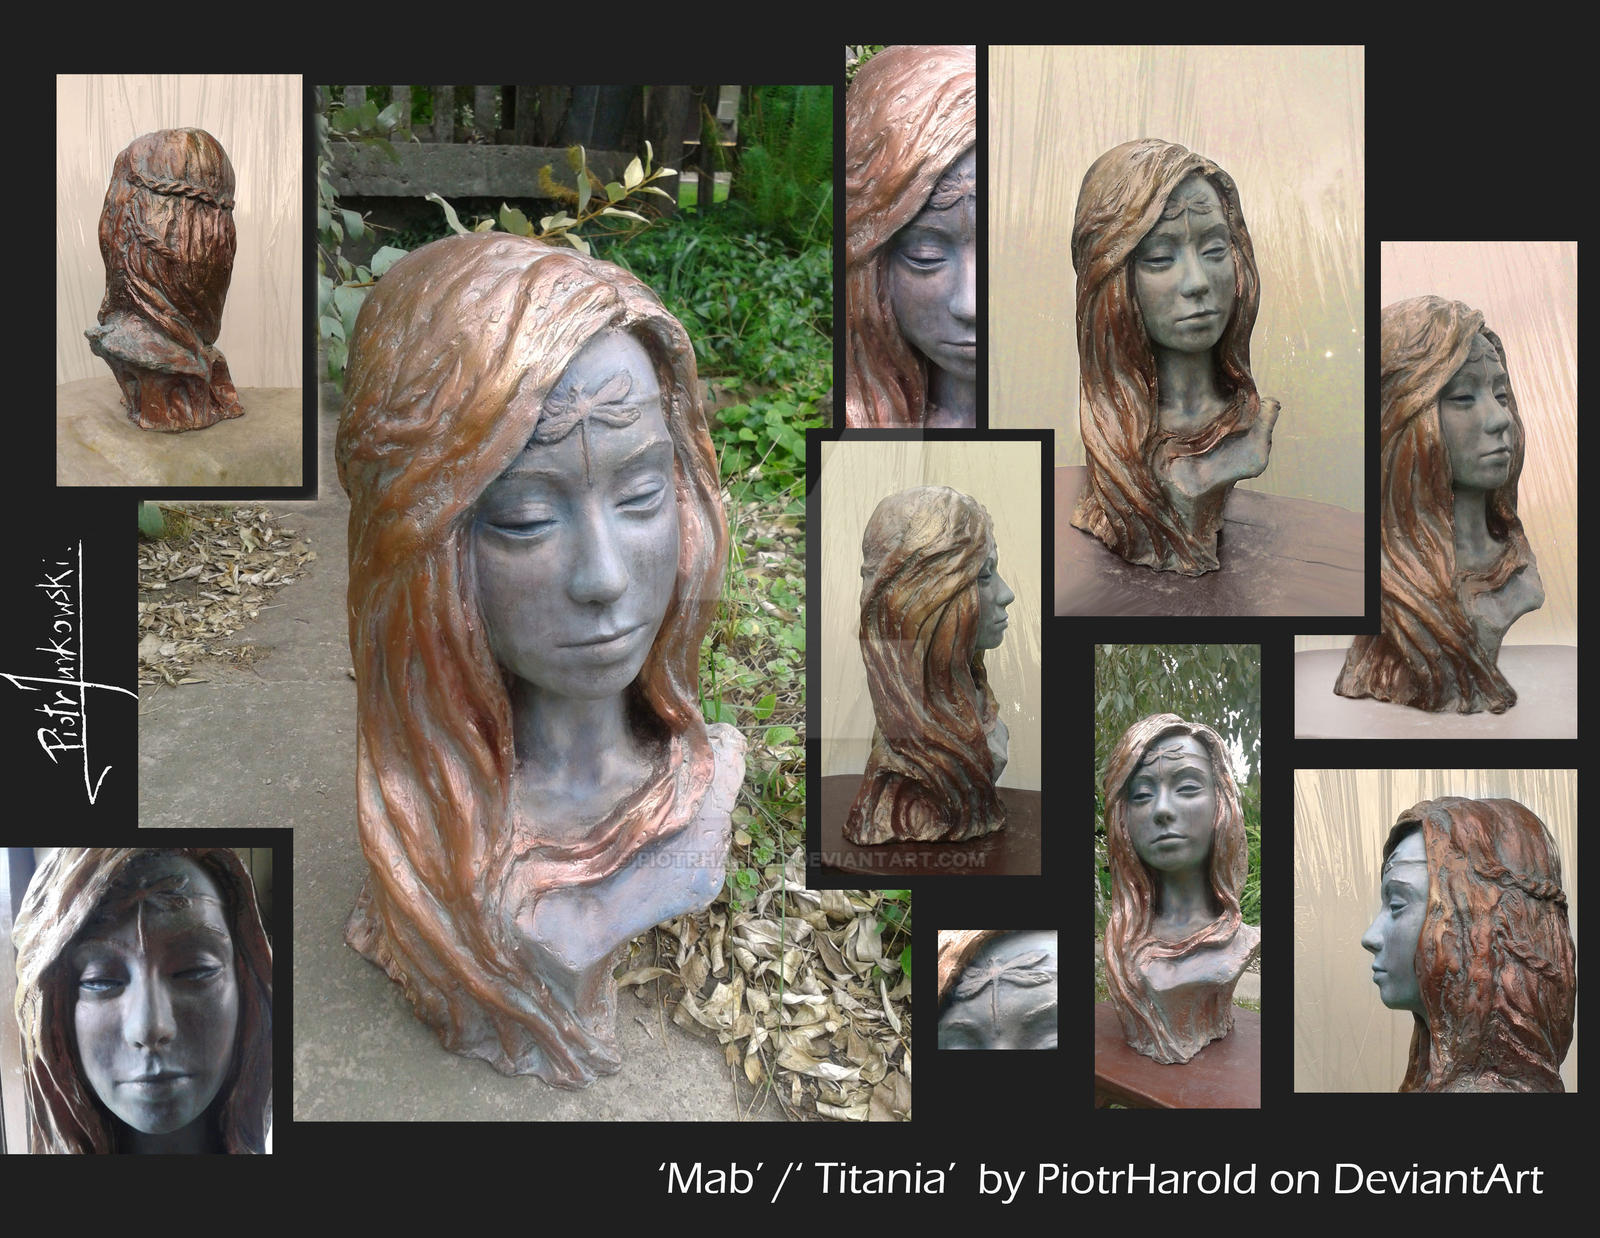 Mab/Titania by PiotrHarold